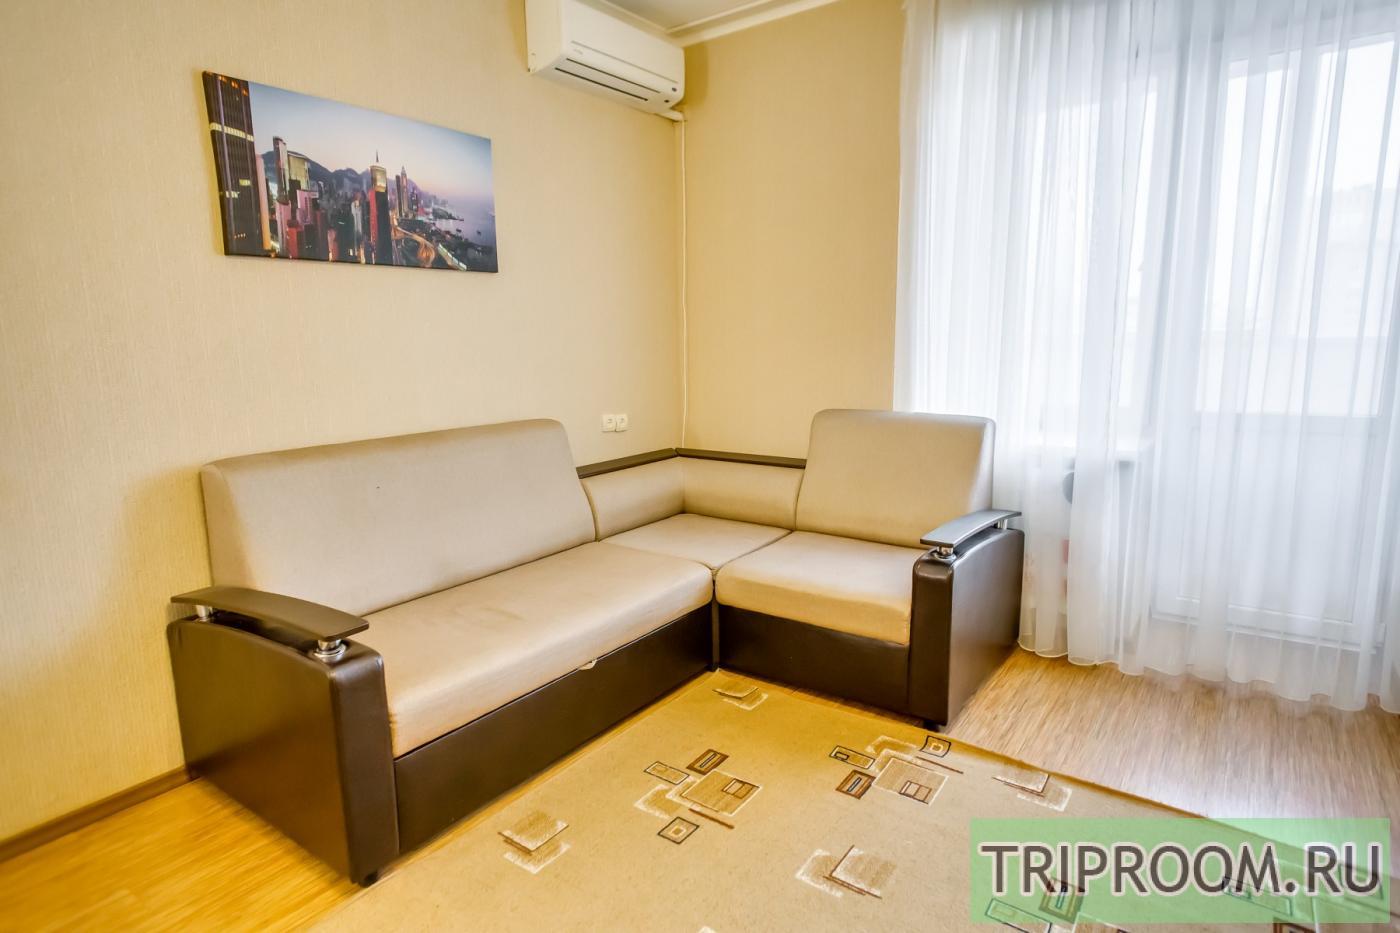 2-комнатная квартира посуточно (вариант № 23730), ул. Максима Горького улица, фото № 3